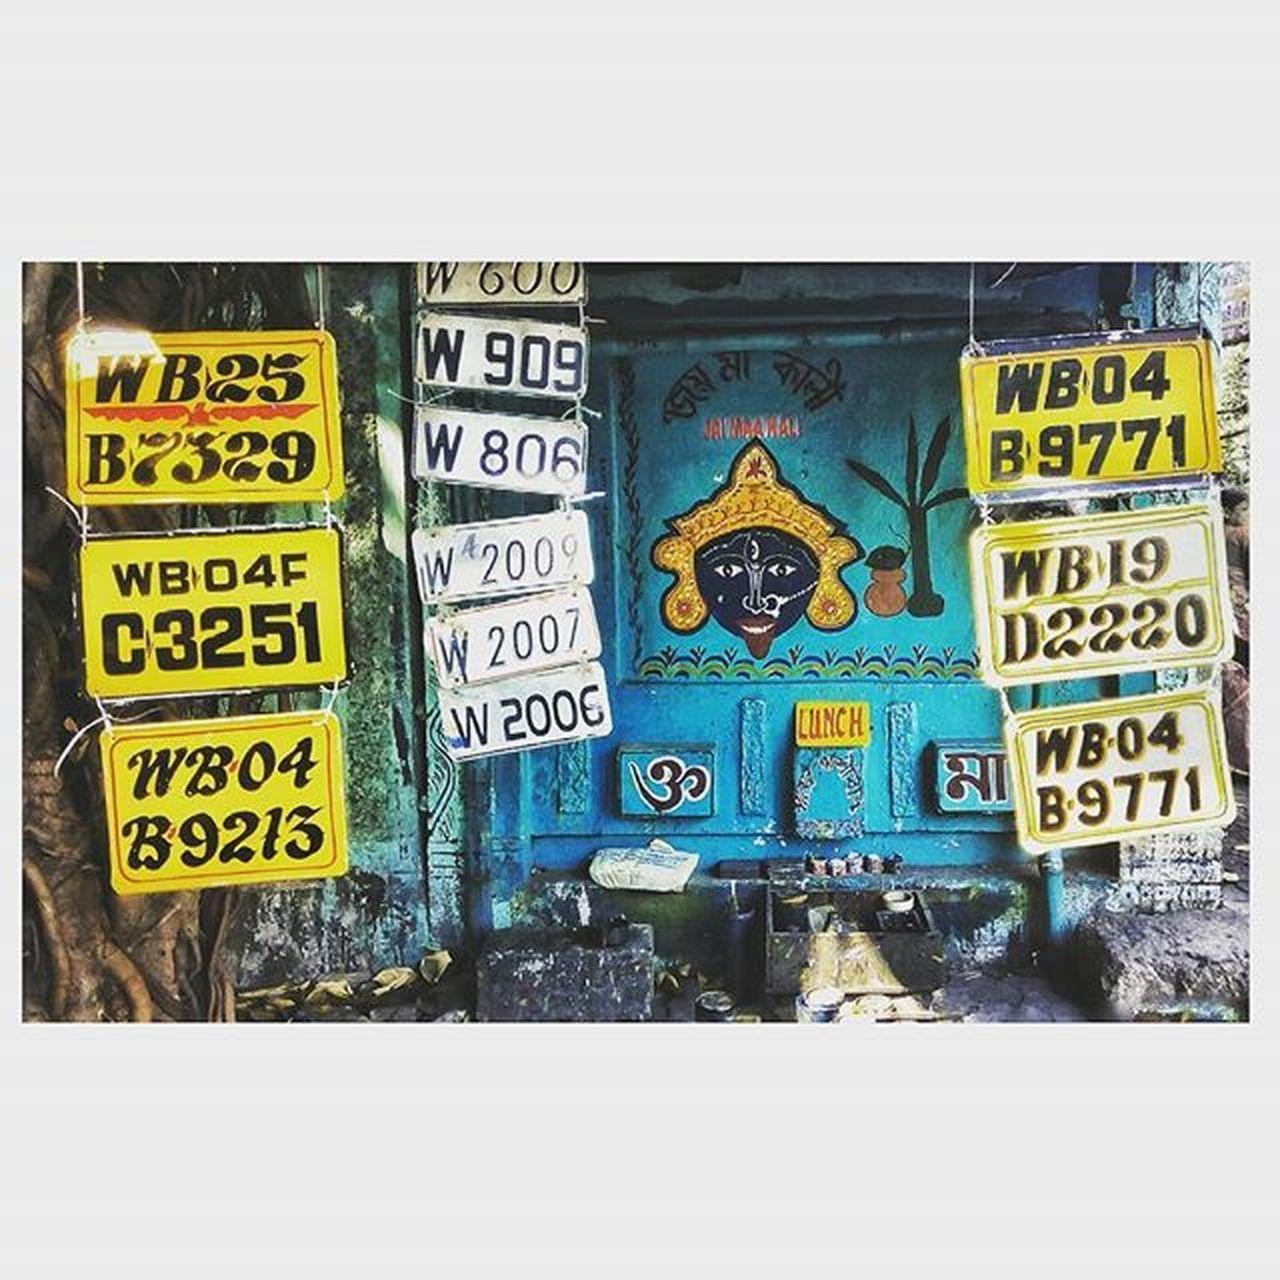 Licenseplates Shop Maakaali Culture Colorplay Yellowandblue Emptyshop Roadside Streetdiary Outdoors Explore Streetart Graffiti Art UrbanART Street Graff Graffitiart Urban Spraypaint Streetphotography Wallart StreetArtEverywhere City Colors instaart photojournalism streetphotographer streetlife mobilephotography